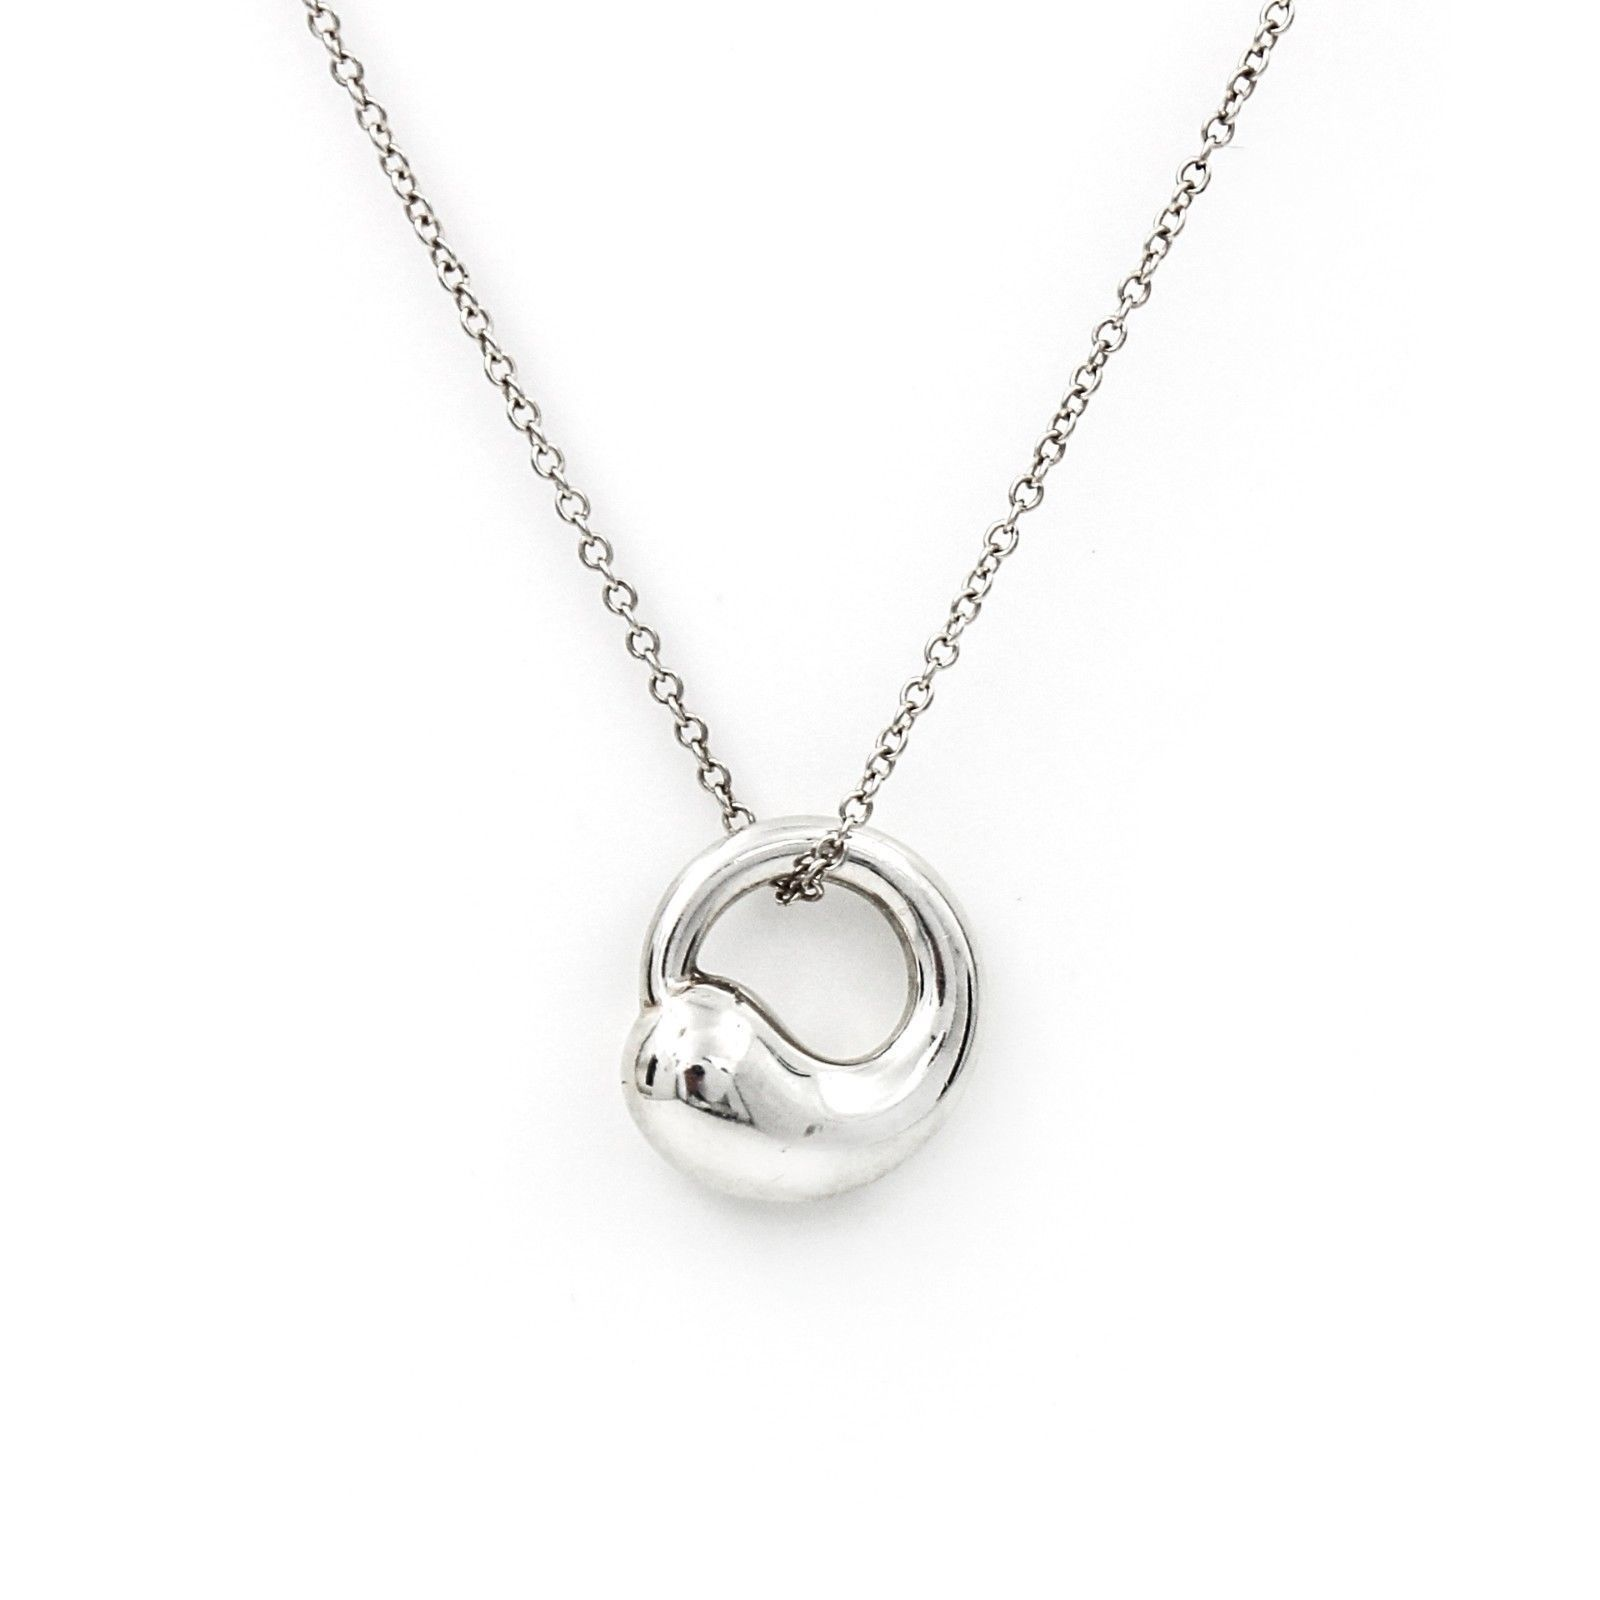 Tiffany co elsa peretti eternal circle necklace in sterling tiffany co elsa peretti eternal circle necklace in sterling silver aloadofball Images